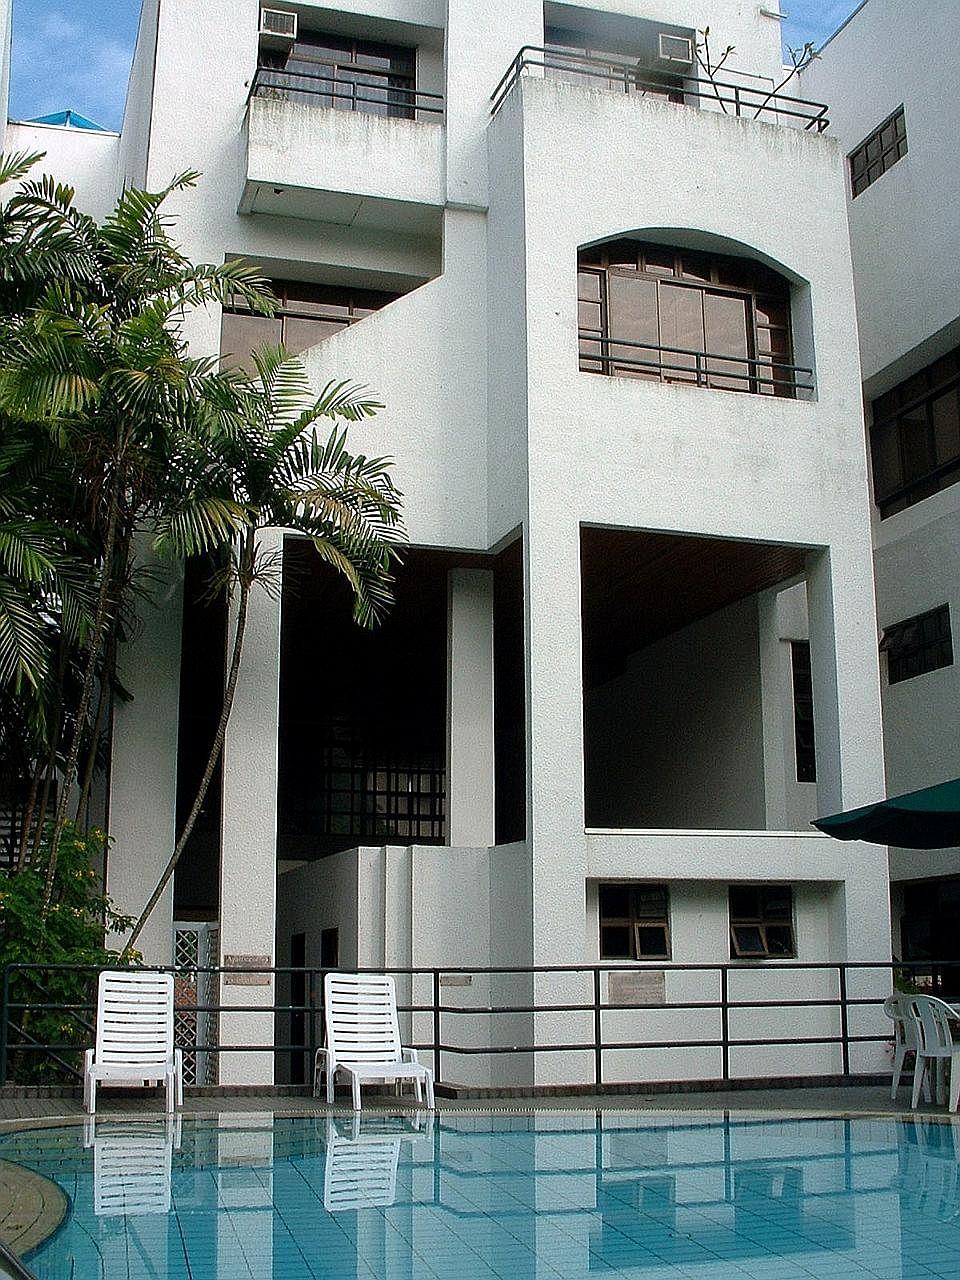 Casa Contendere, near Newton MRT, is a four-storey block with 11 maisonette units.